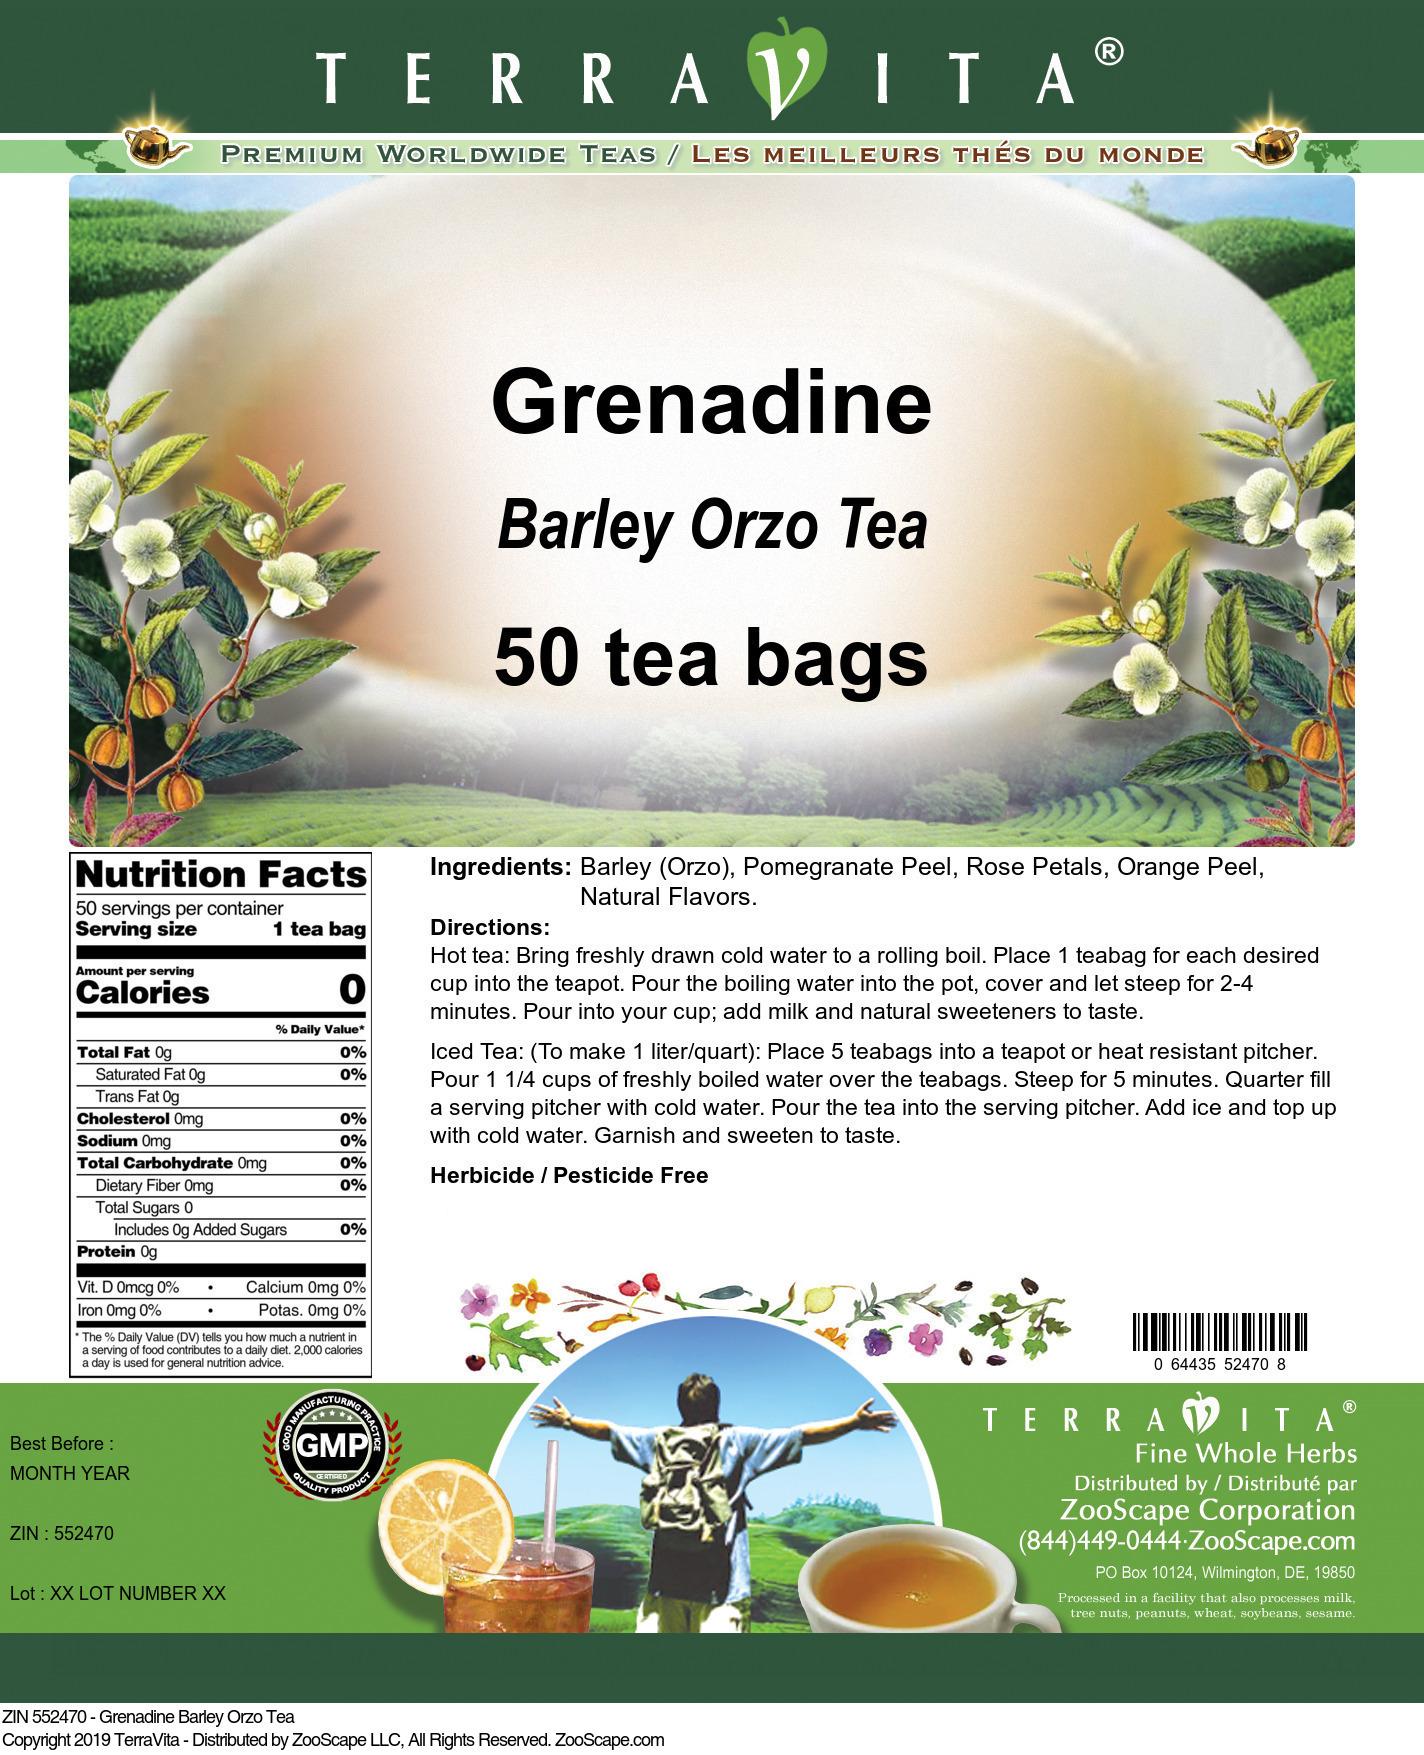 Grenadine Barley Orzo